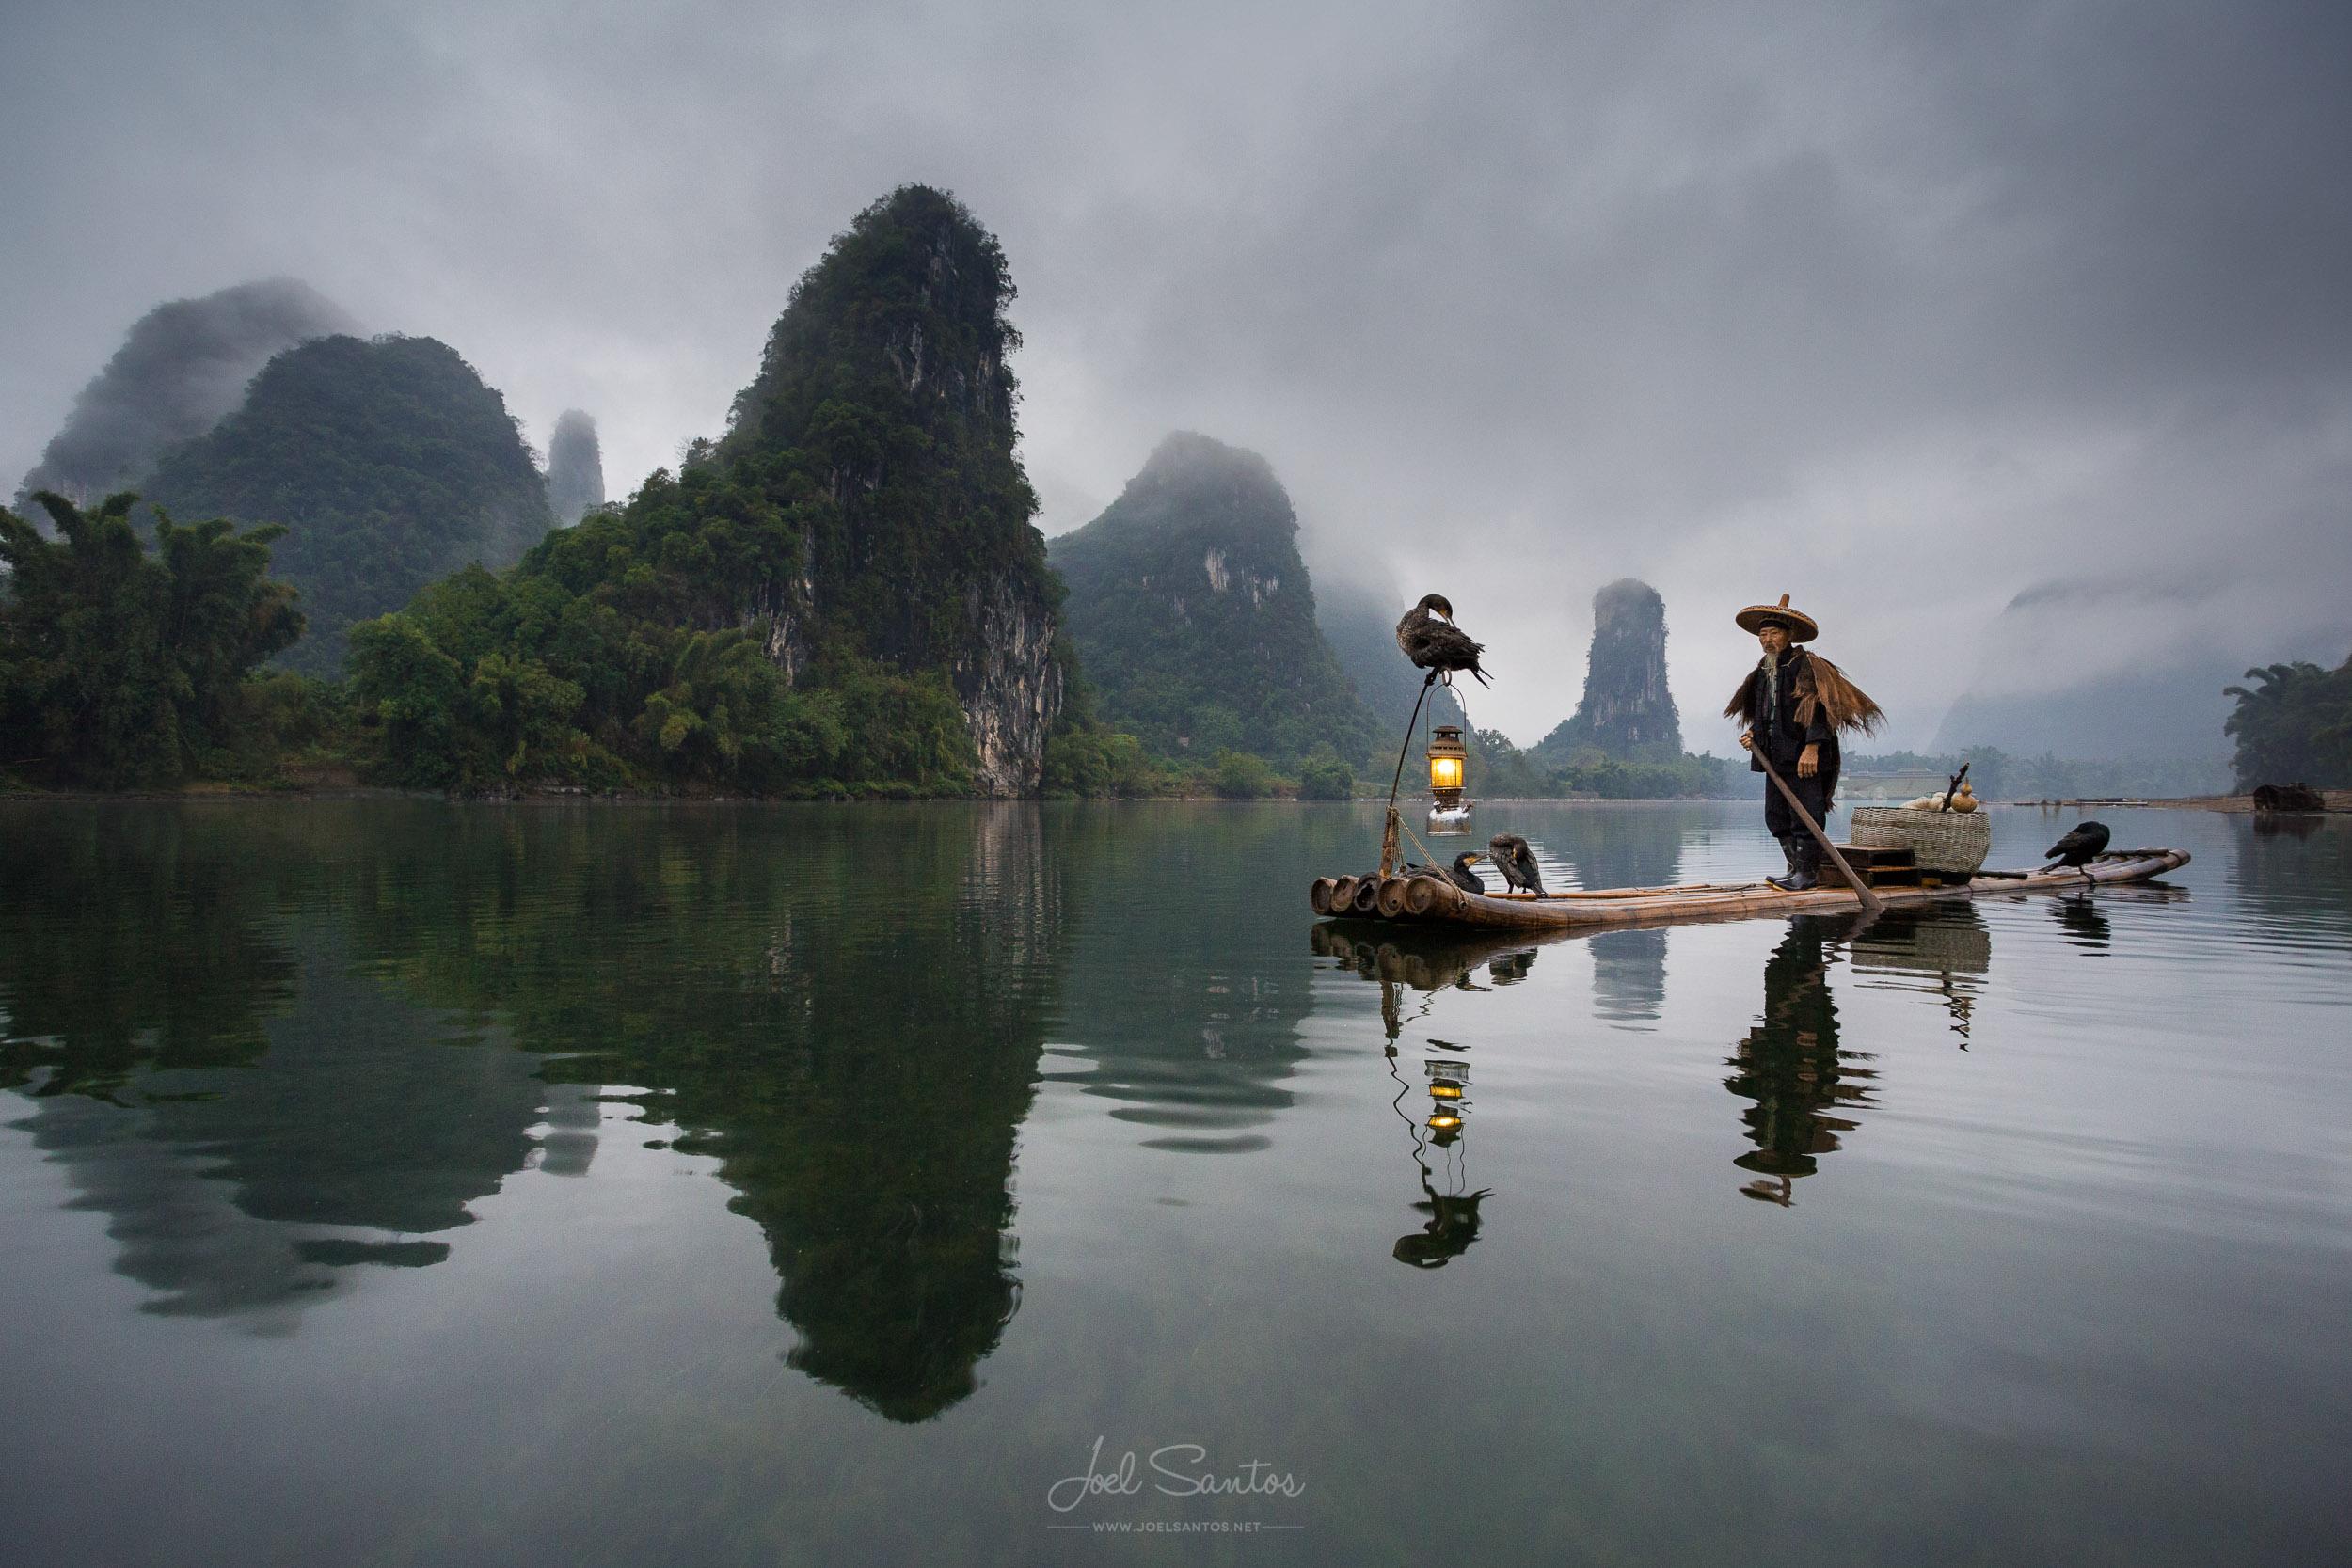 Cormorant Fisherman, Li River, Guangxi, China